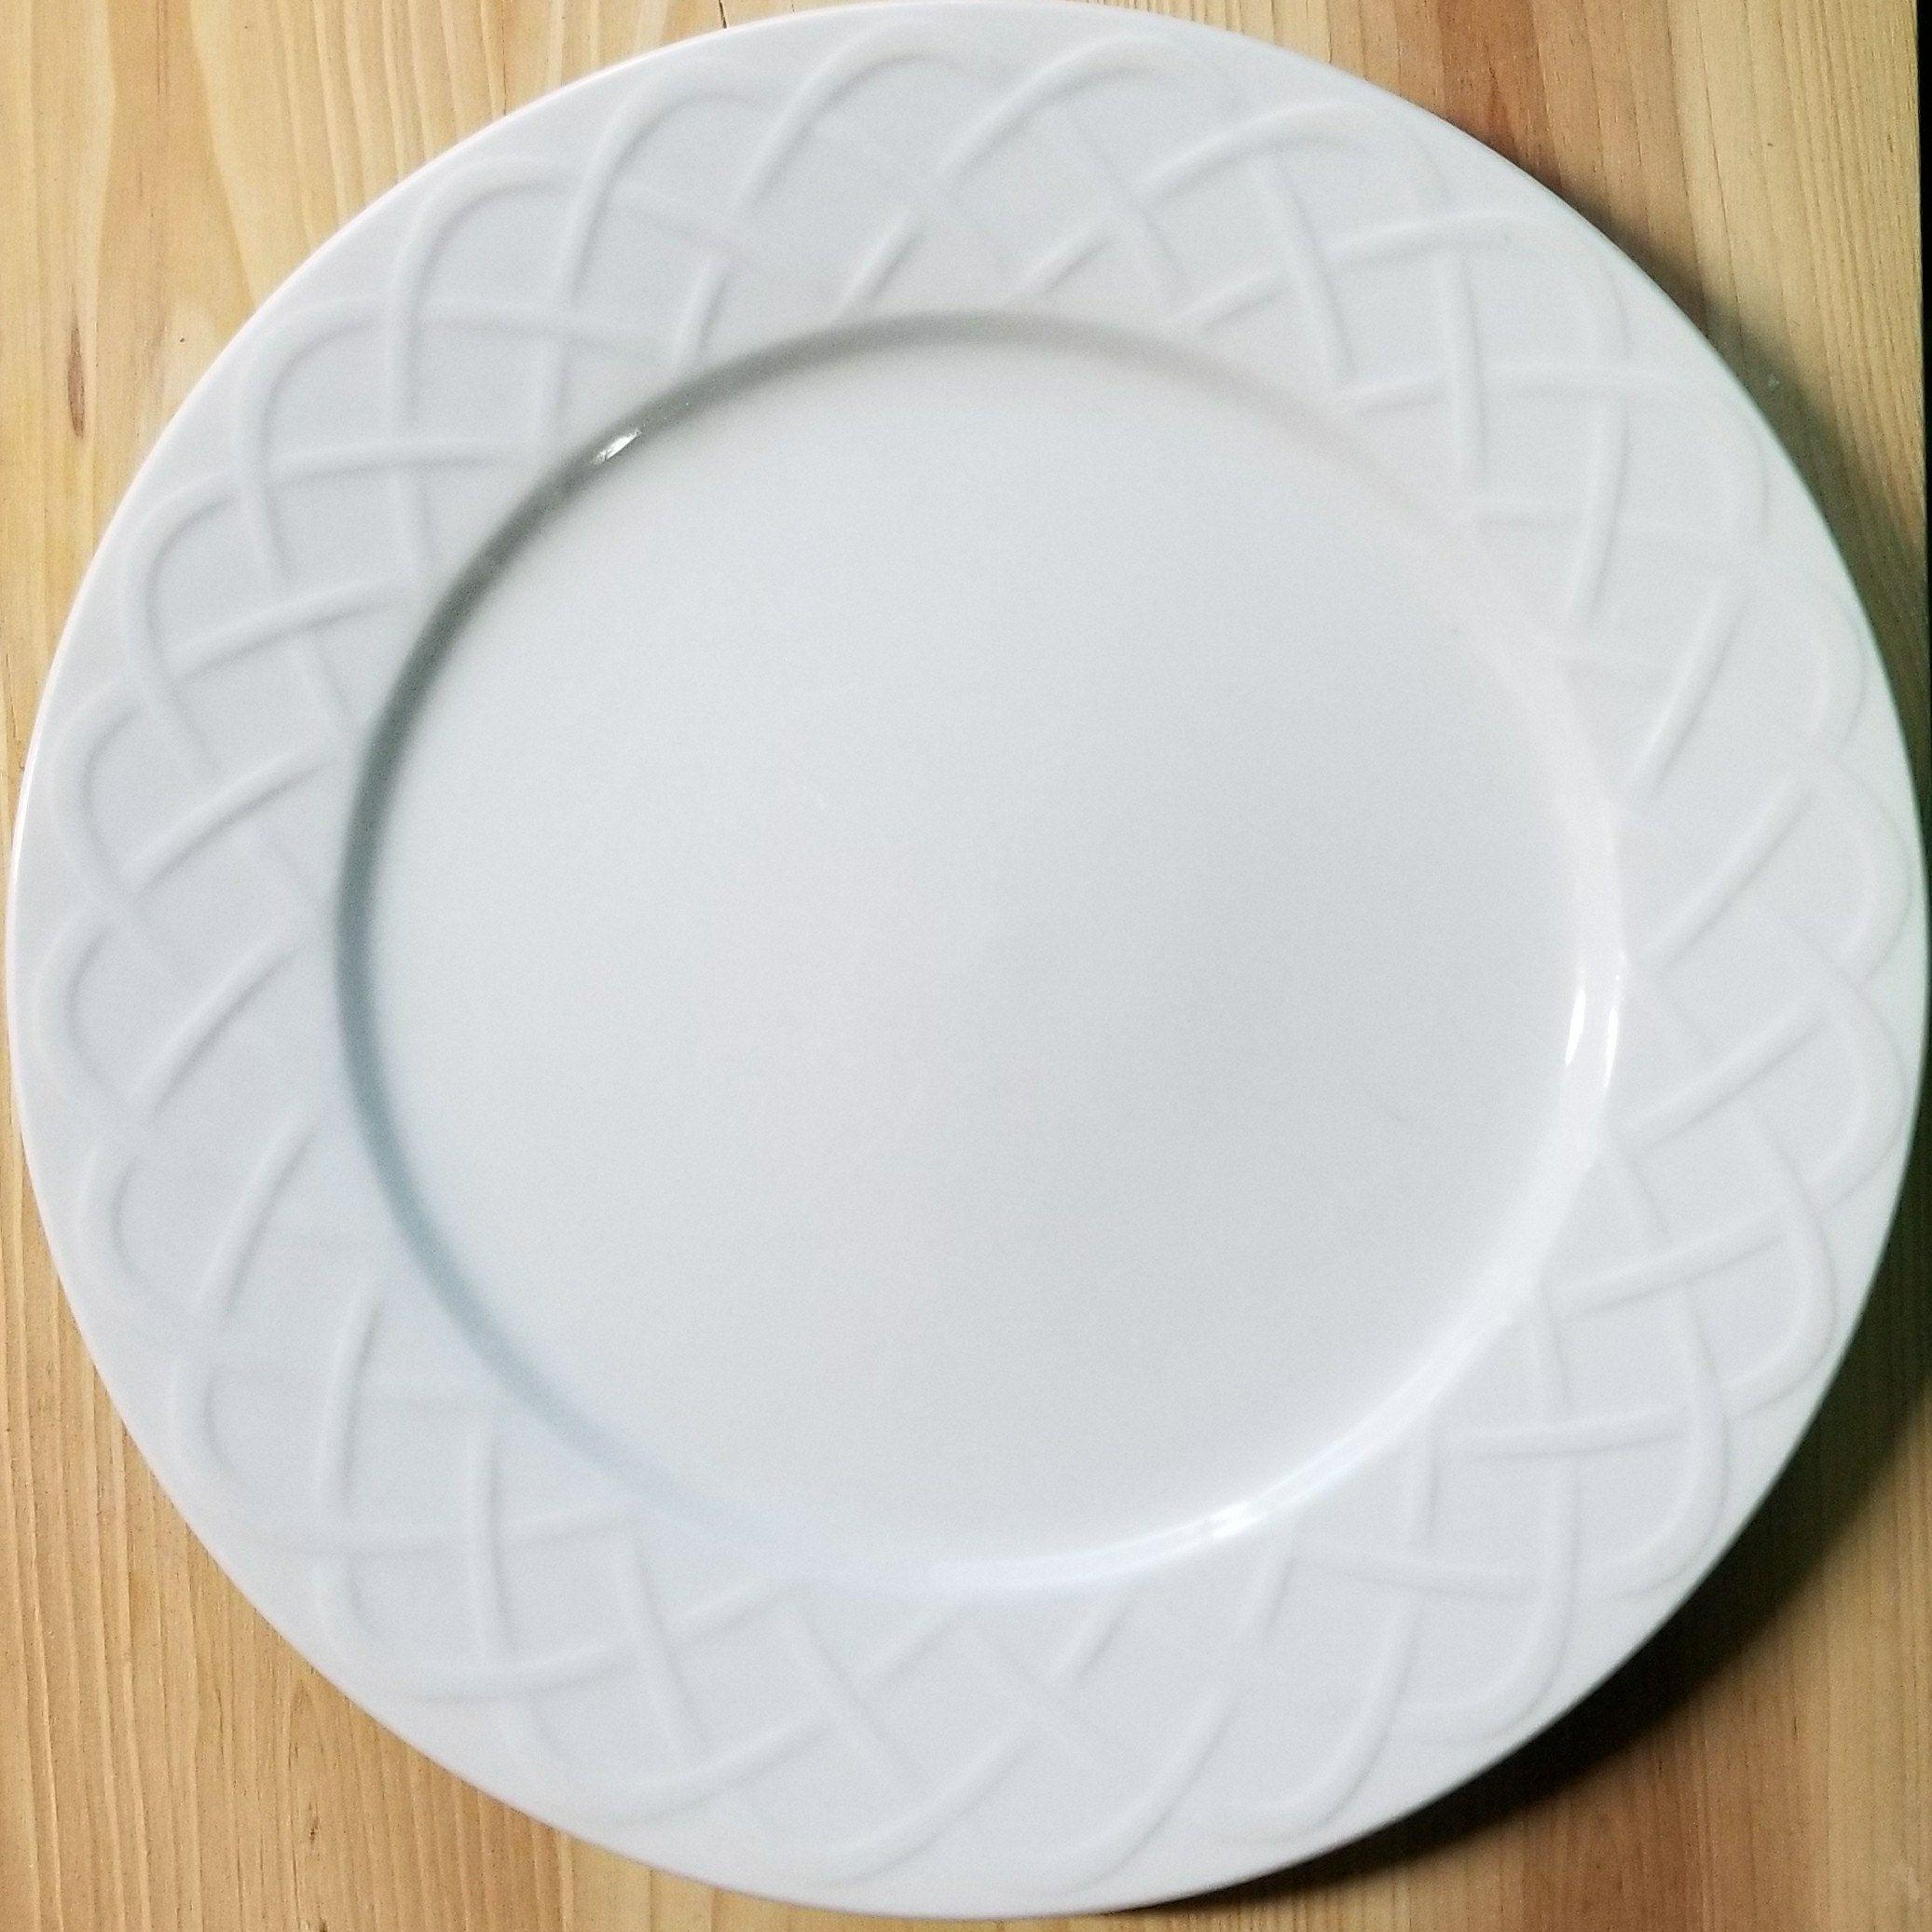 Ceramic Plates/Oneida Picnic Plates/Vintage China/Oneida Picnic Dinner Plates/ Oneida Chop Plate/Oneida China Plates/Ceramic Plates/Oneida & Ceramic Plates/Oneida Picnic Plates/Vintage China/Oneida Picnic ...